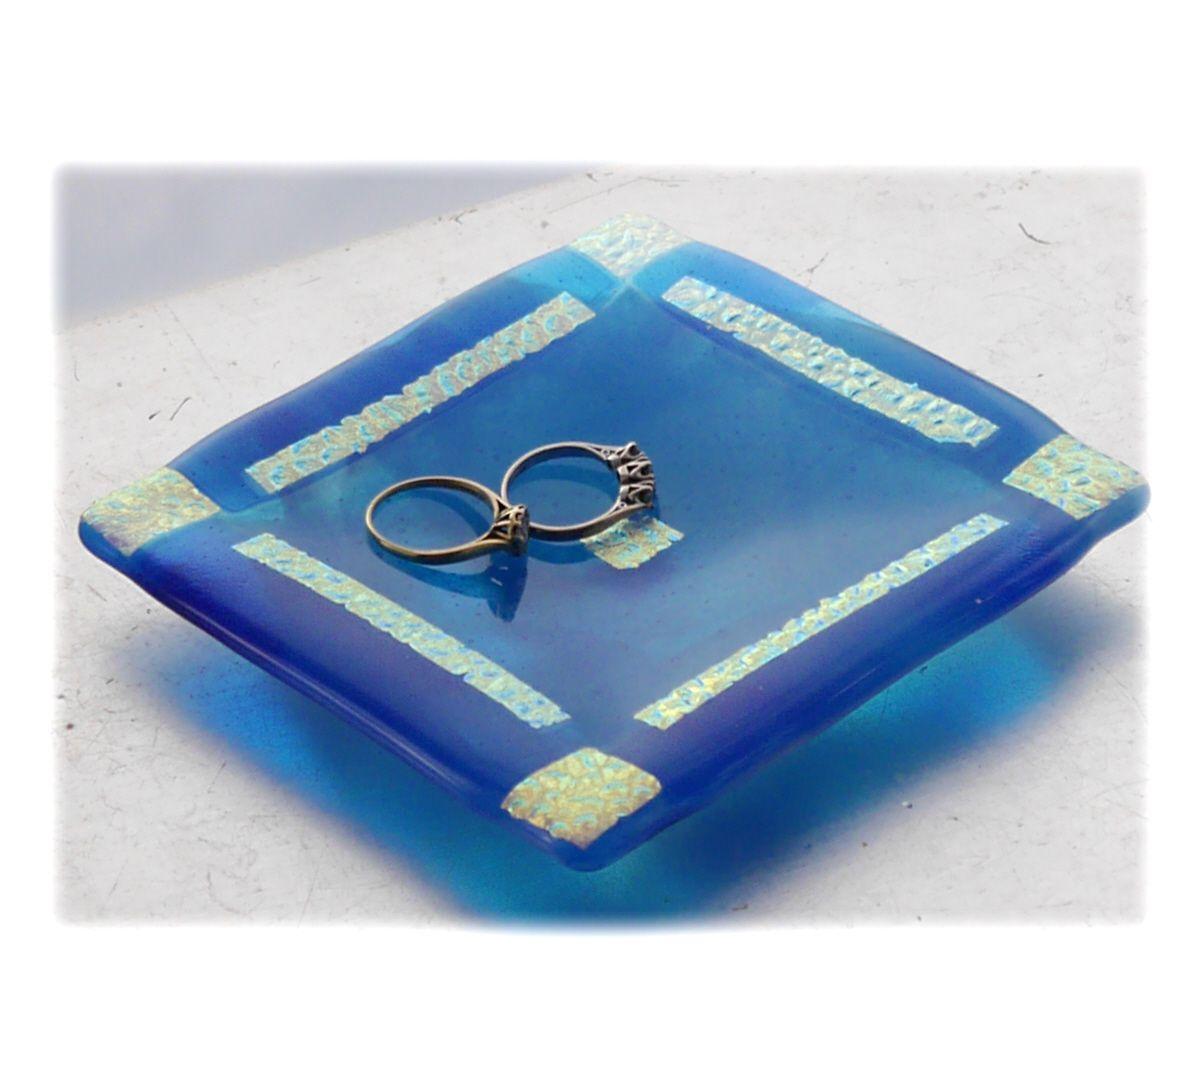 11.5cm Turquoise Gold border Dish 001 #1905 FREE 16.00